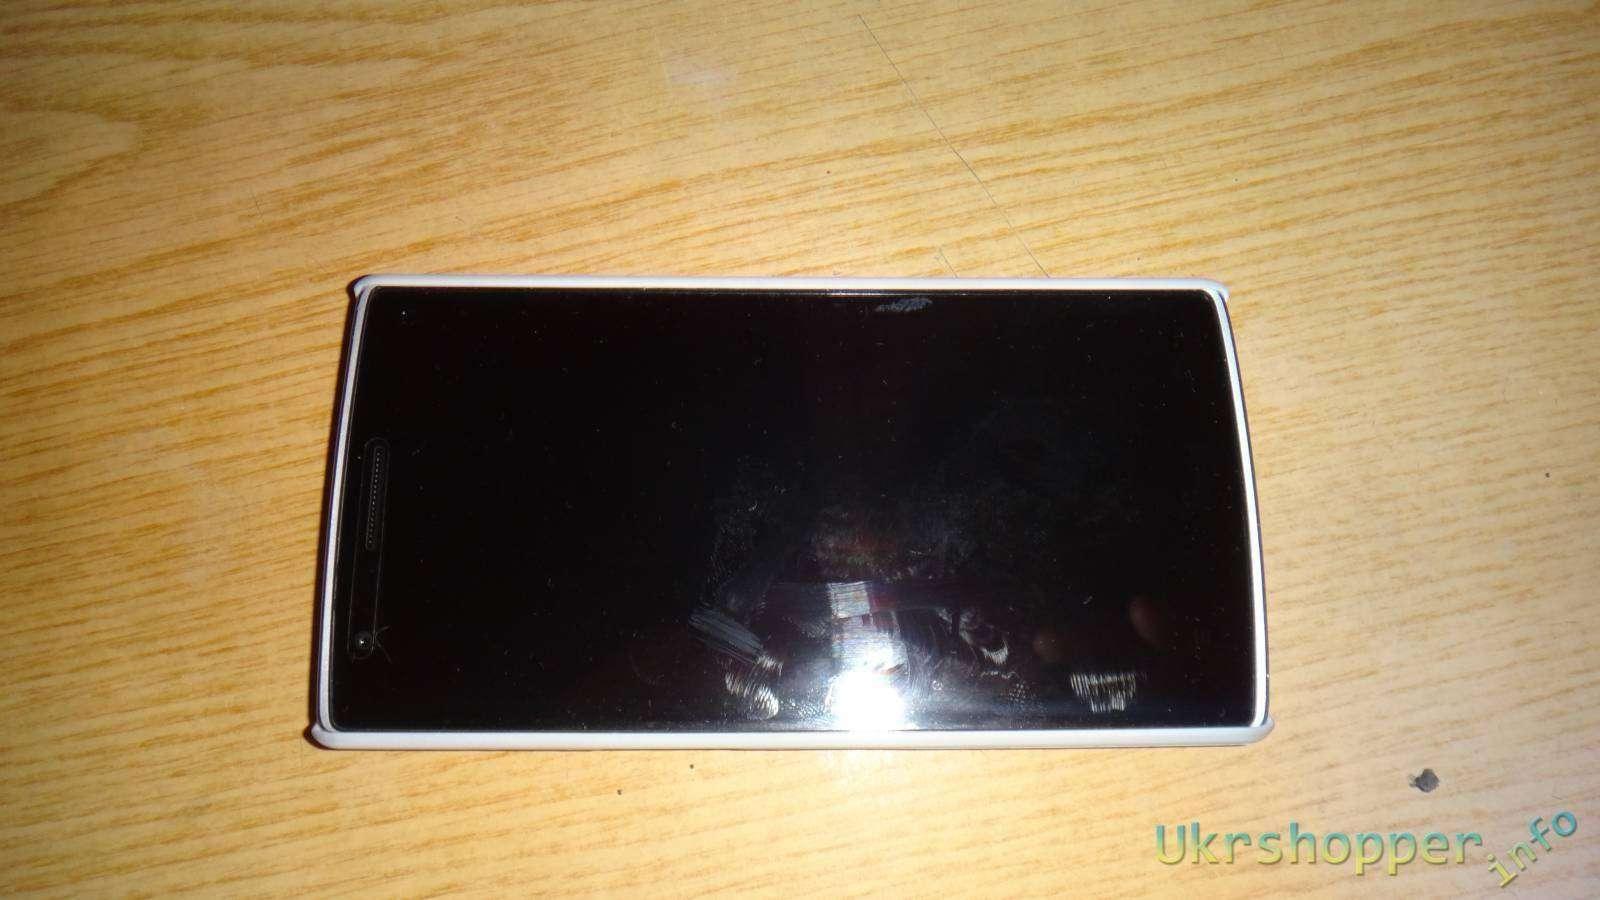 CooliCool: Защитный бампер NILLKIN и хорошая пленка на экран для смартфона OnePlus One